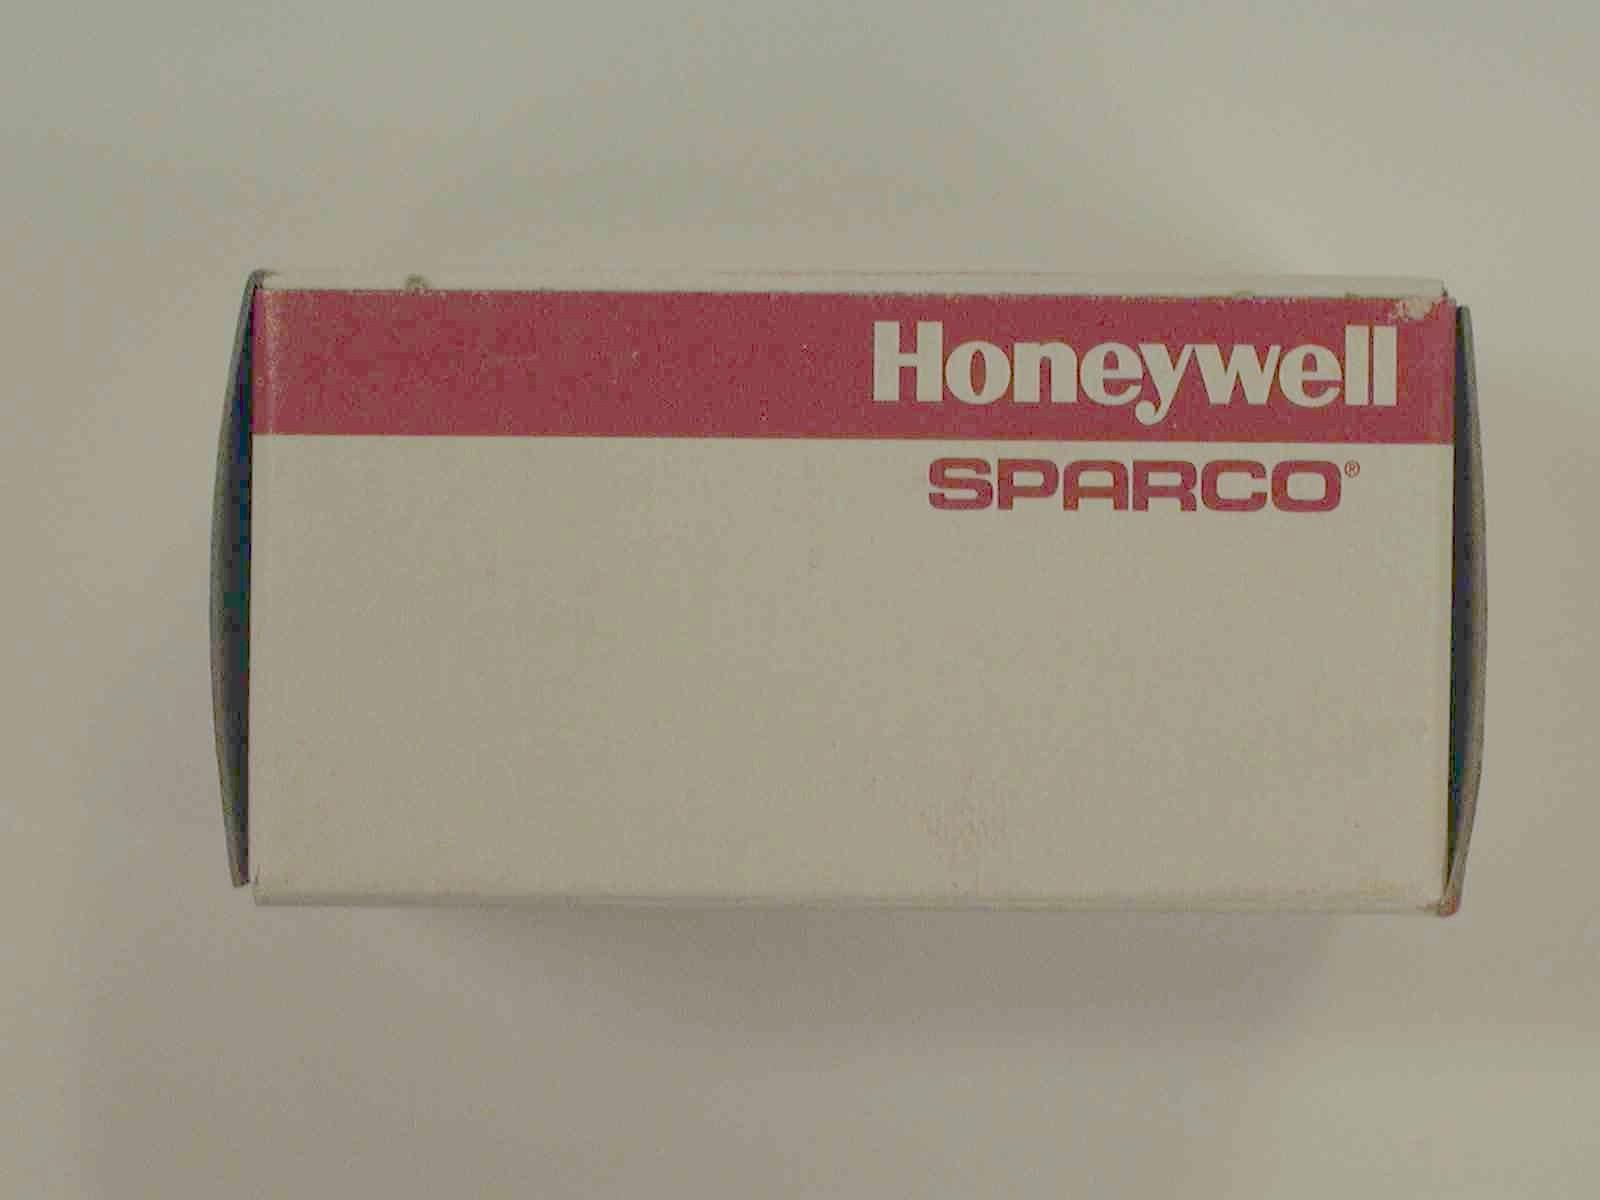 Honeywell fv goldtop hydronic heating air vent boiler